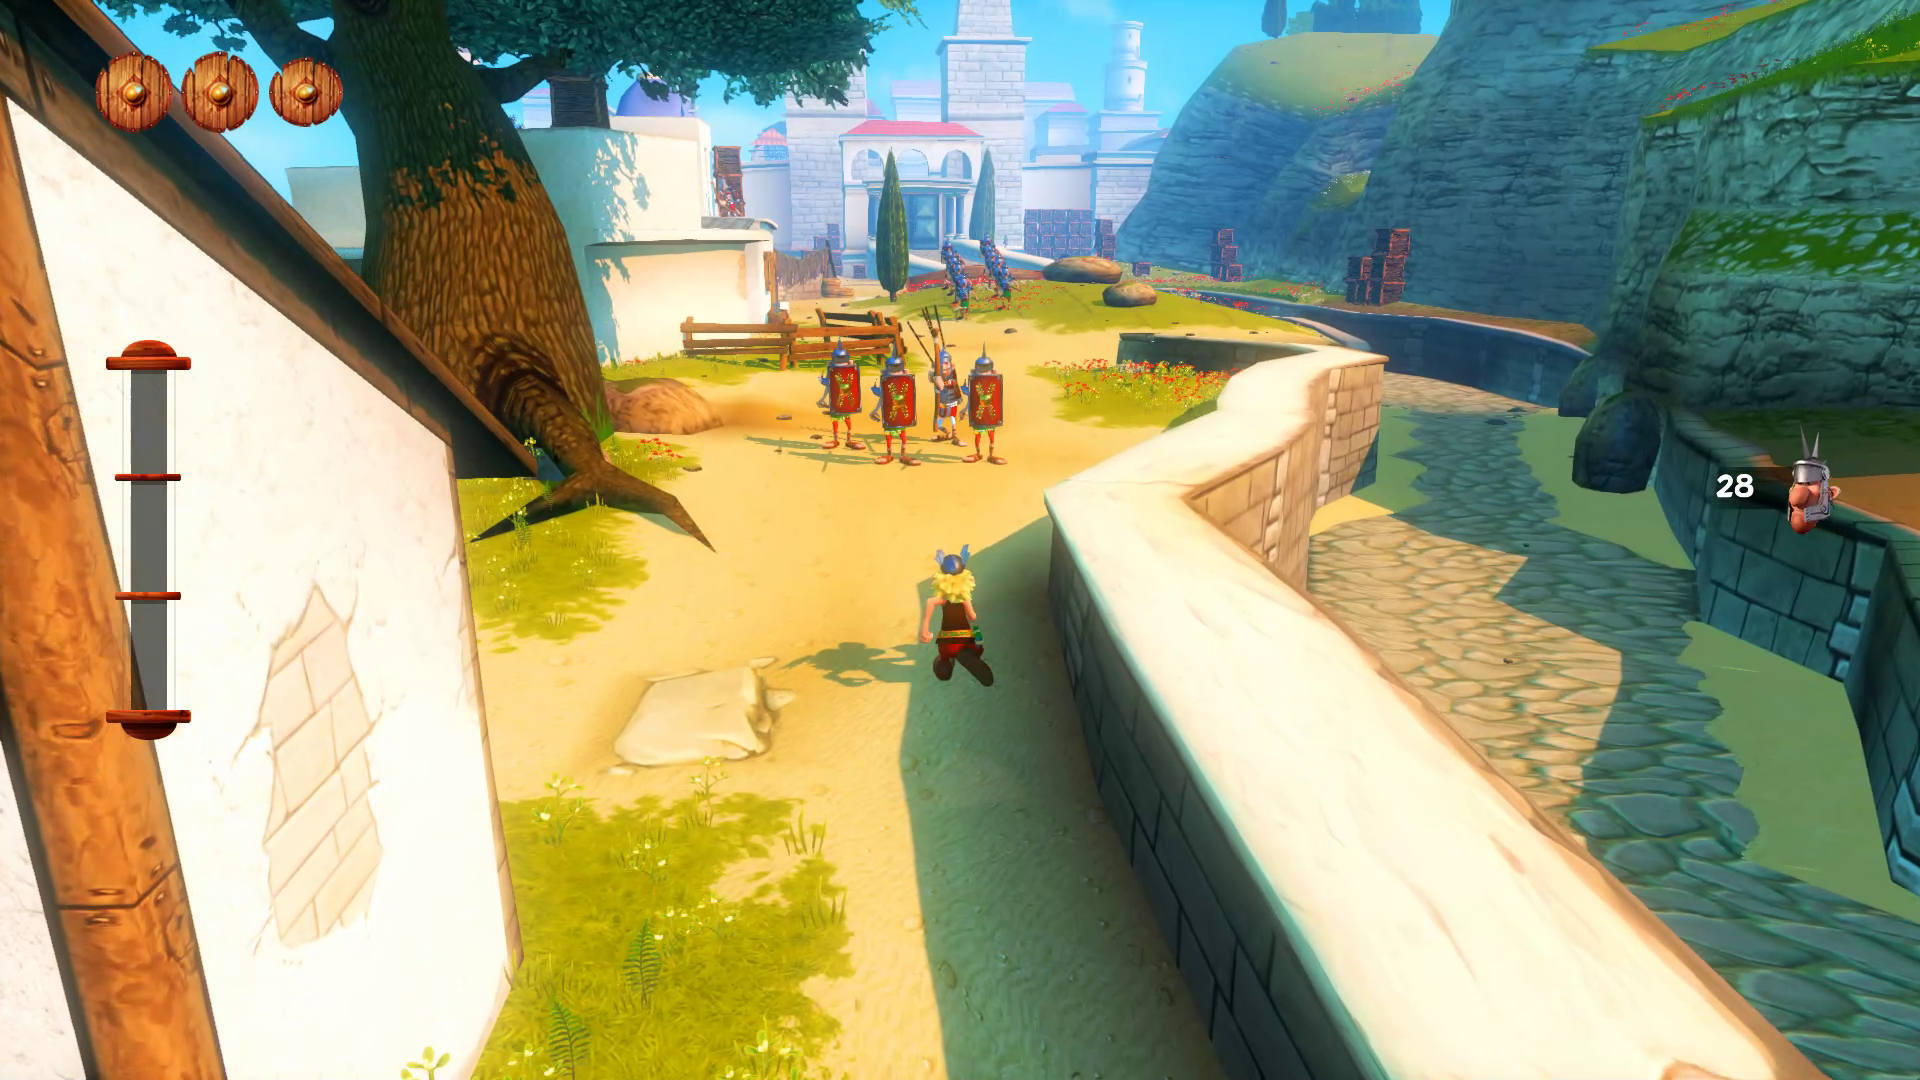 asterix-and-obelix-xxl-romastered-pc-screenshot-01